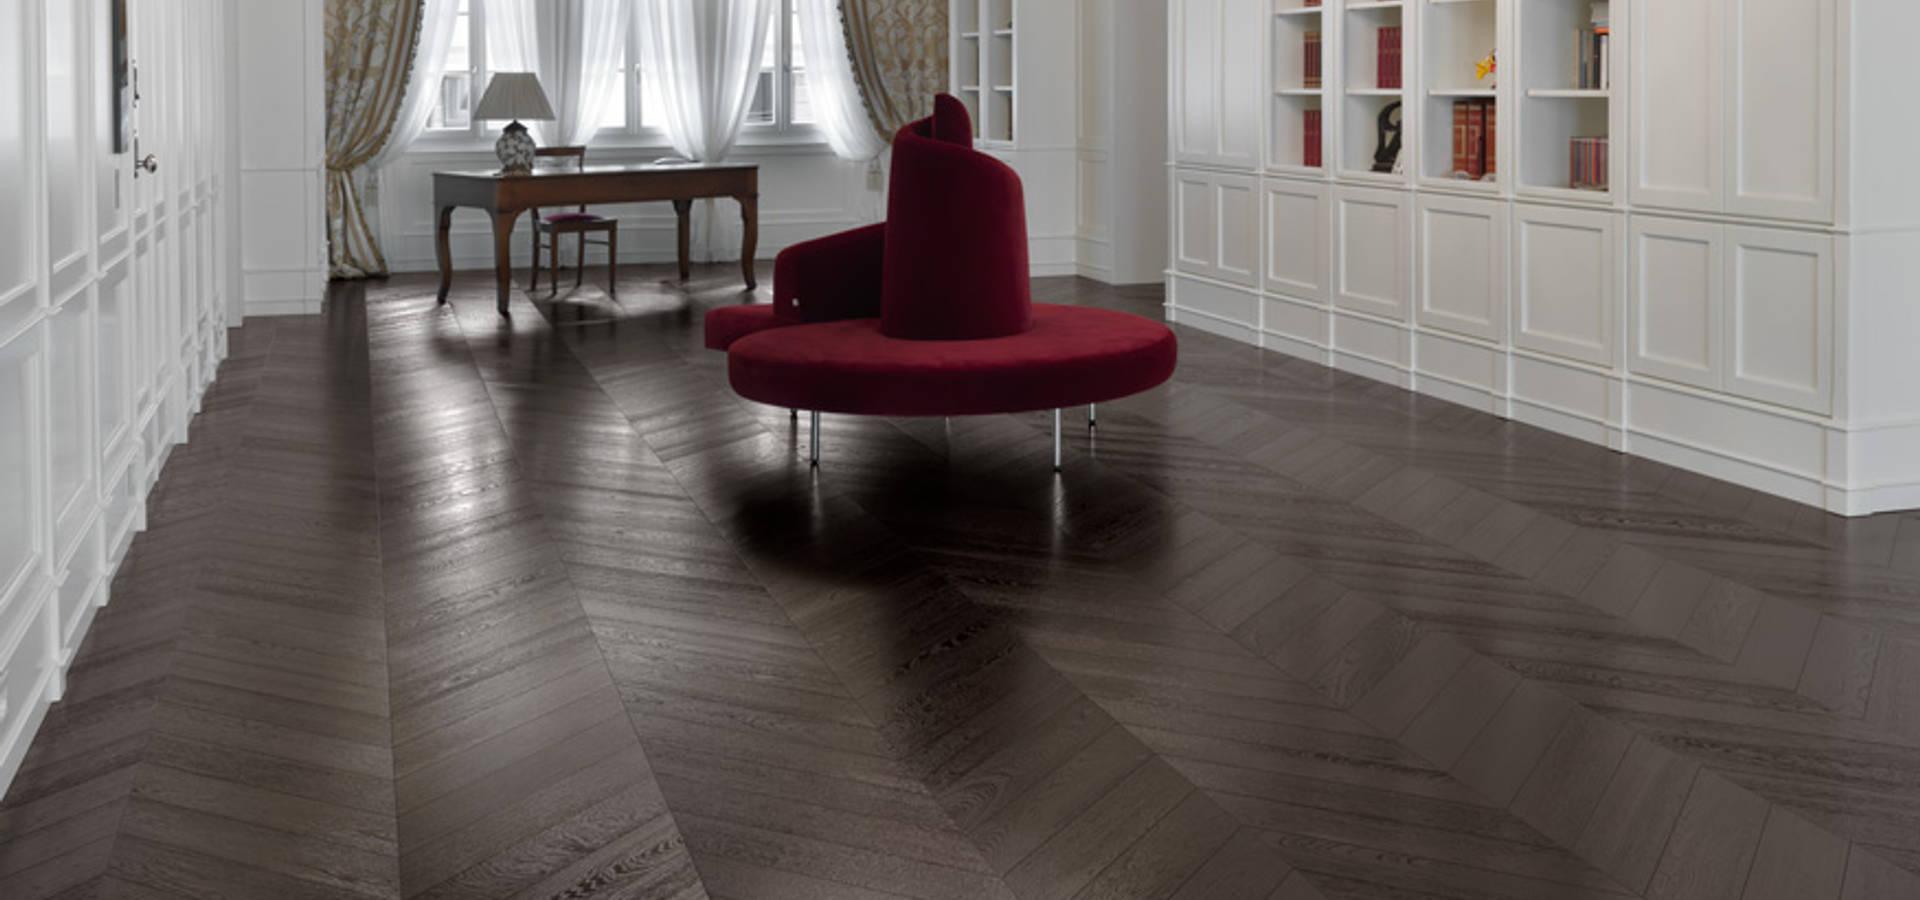 Cadorin Group Srl – Top Quality Wood Flooring